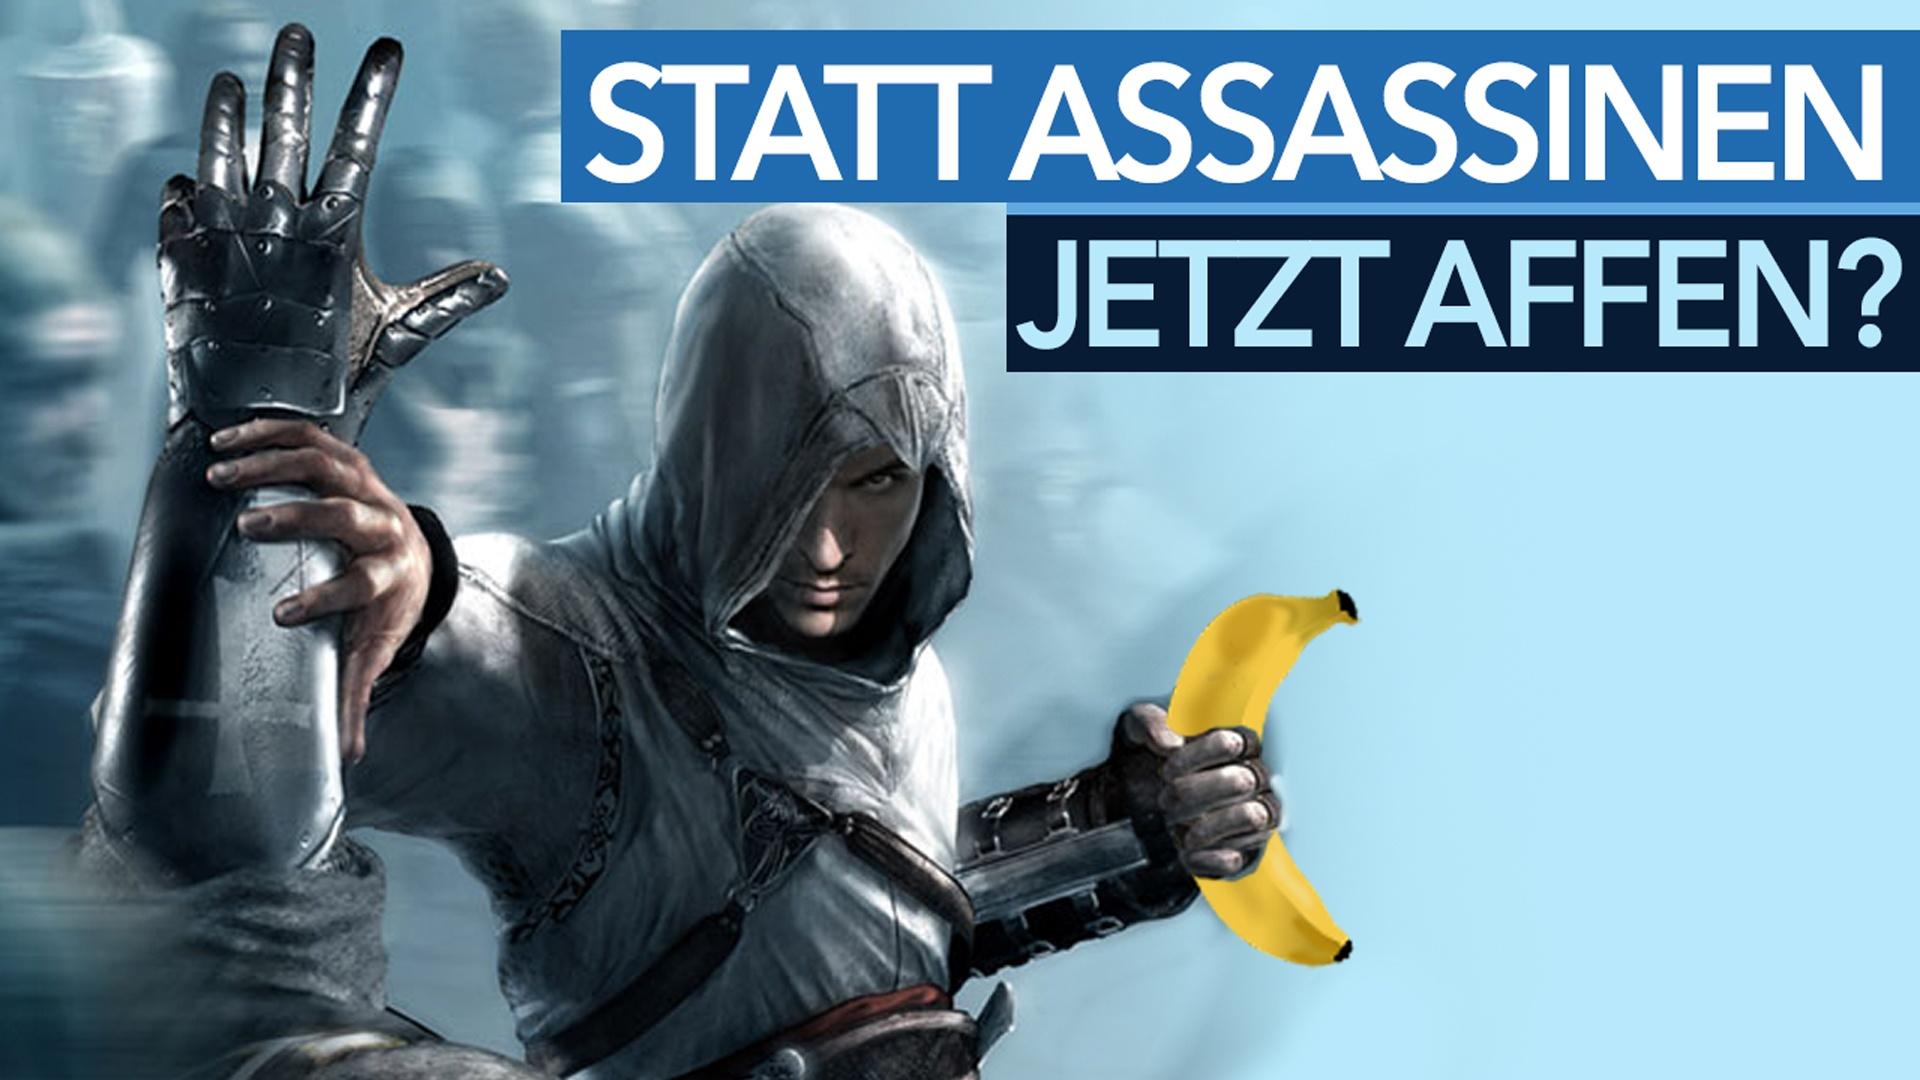 Ich kann Assassin's Creed nicht mehr spielen« - Warum Patrice Désilets lieber an Affen als Assassinen arbeitet